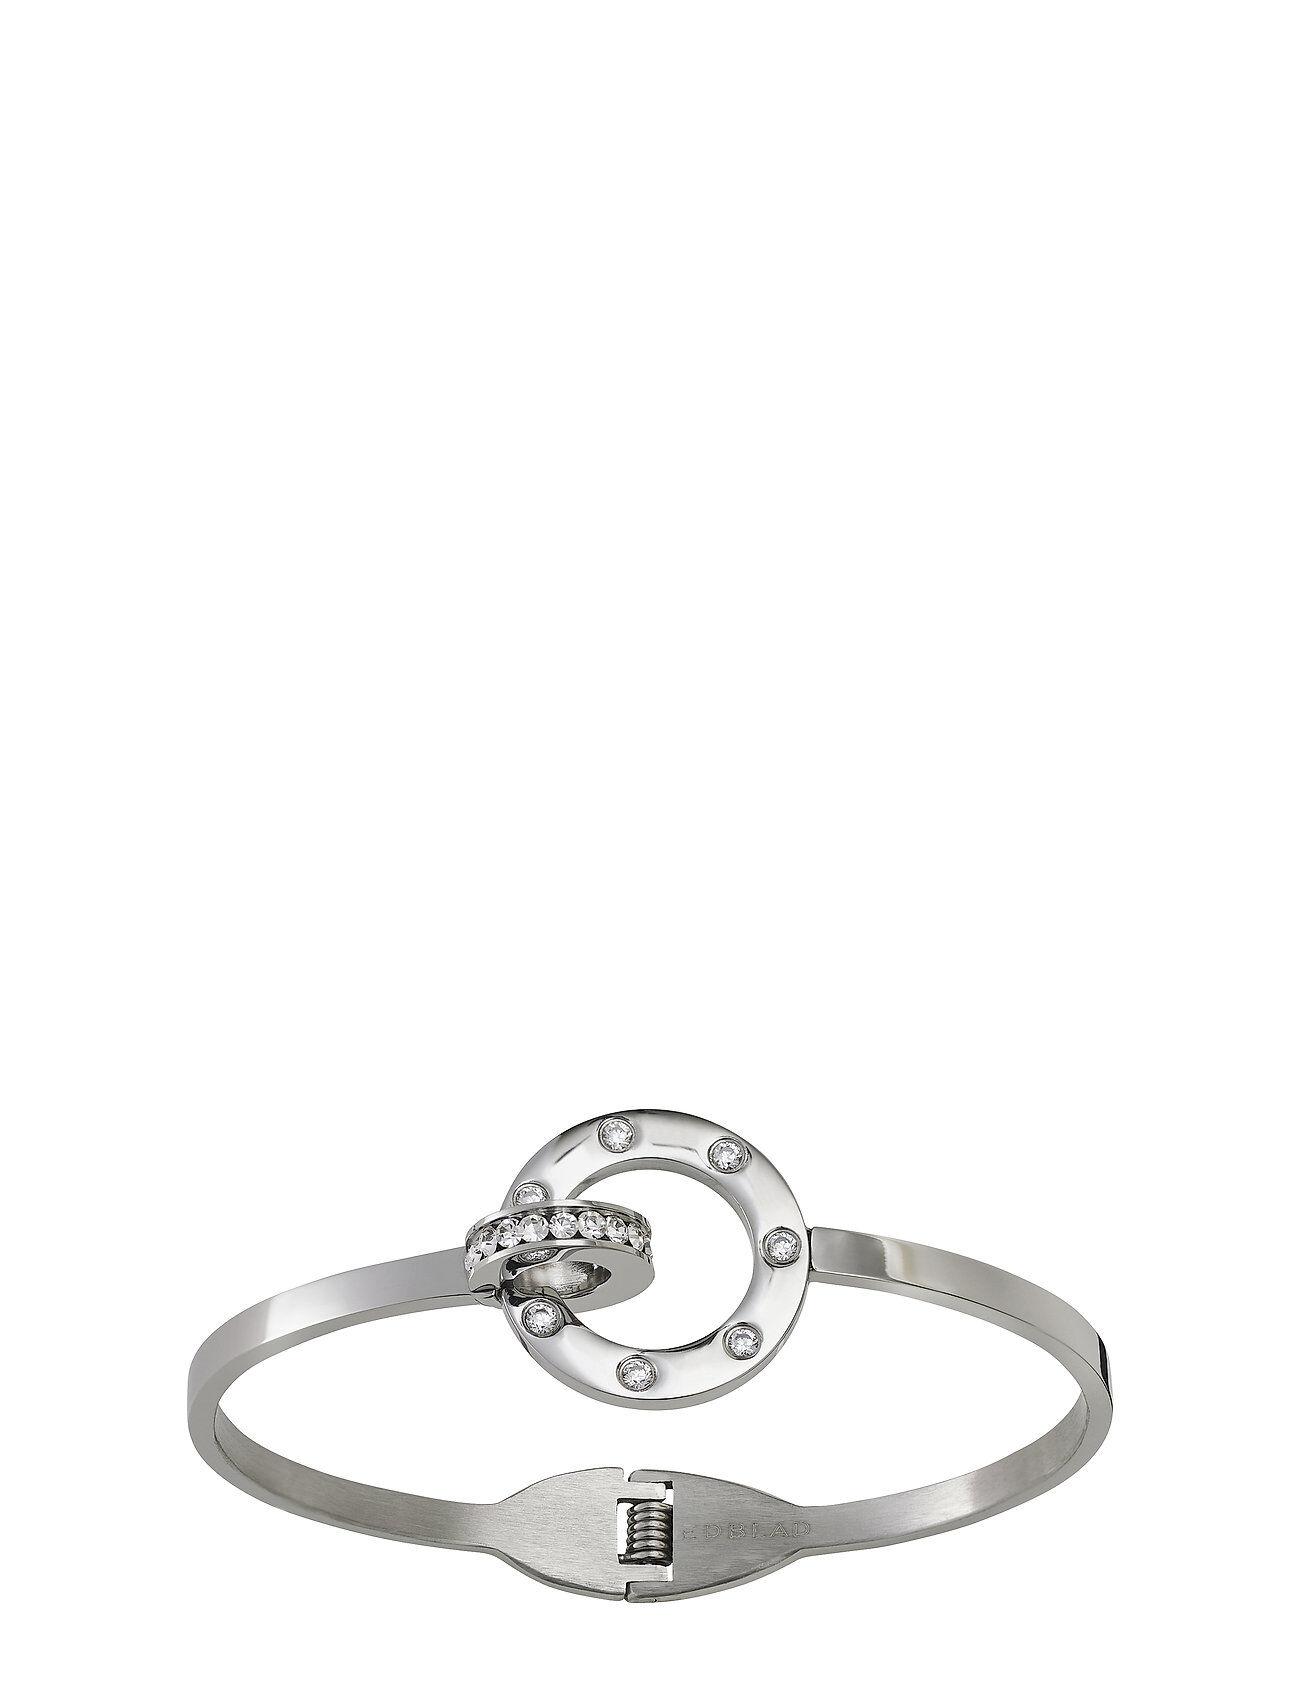 Edblad Ida Bangle Accessories Jewellery Bracelets Bangles Hopea Edblad